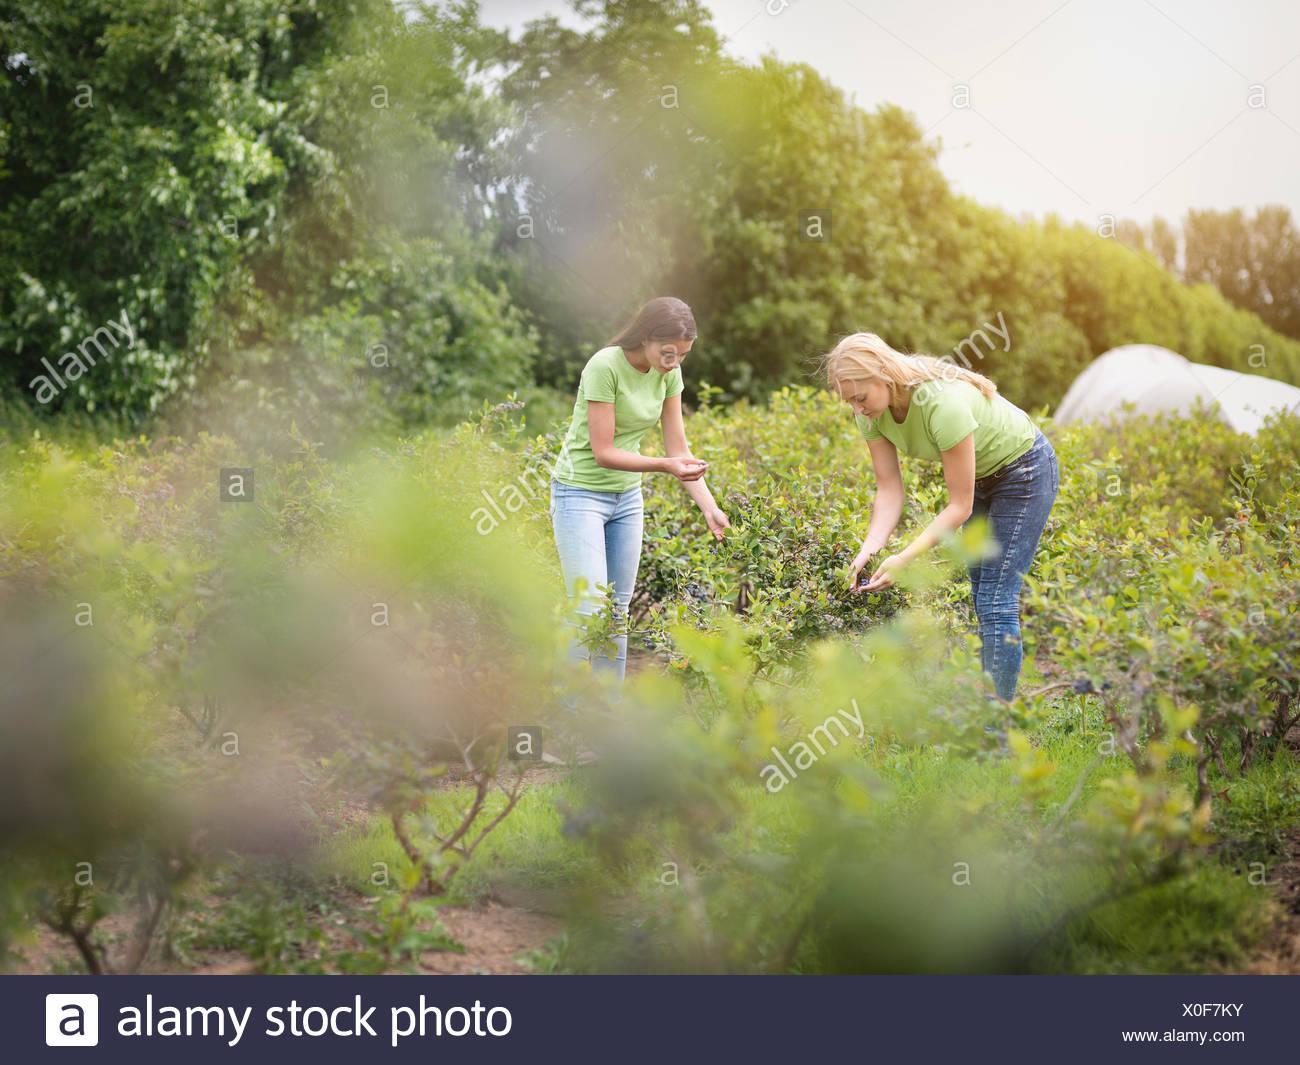 Arbeiter am Obsthof Blaubeeren pflücken Stockbild